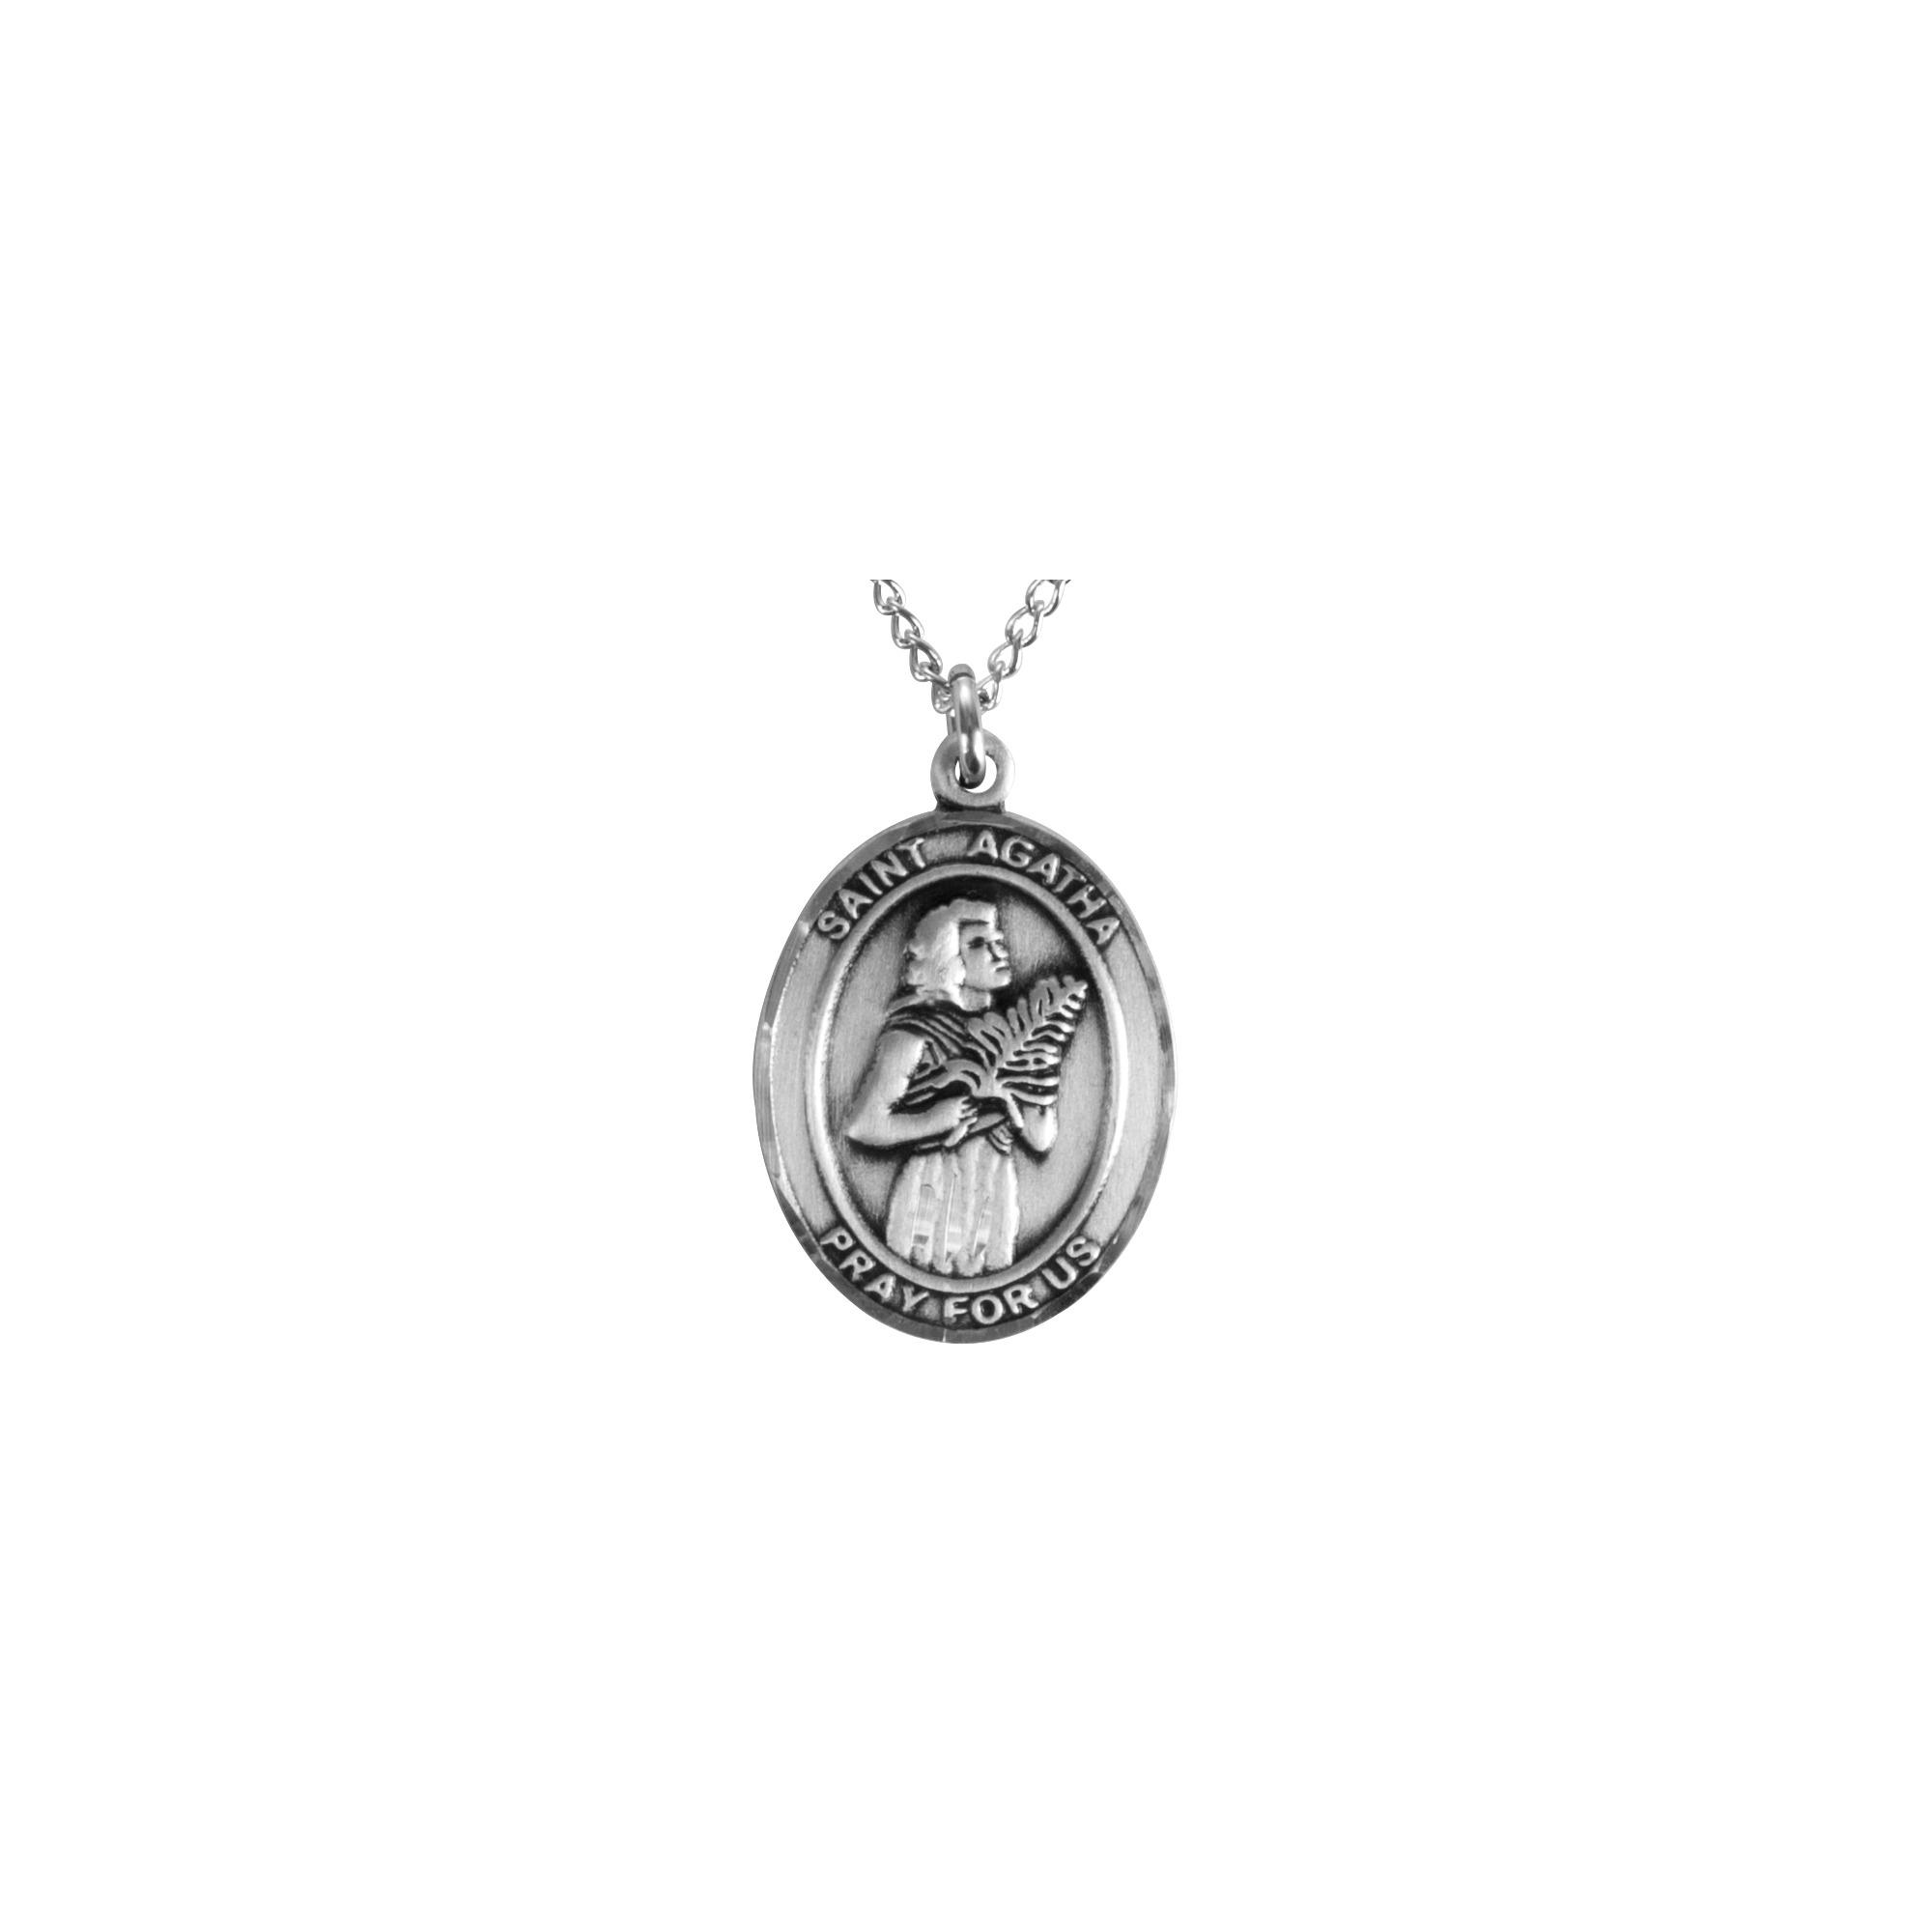 Sterling Silver St. Agatha - Nurse Pendant w/ Chain